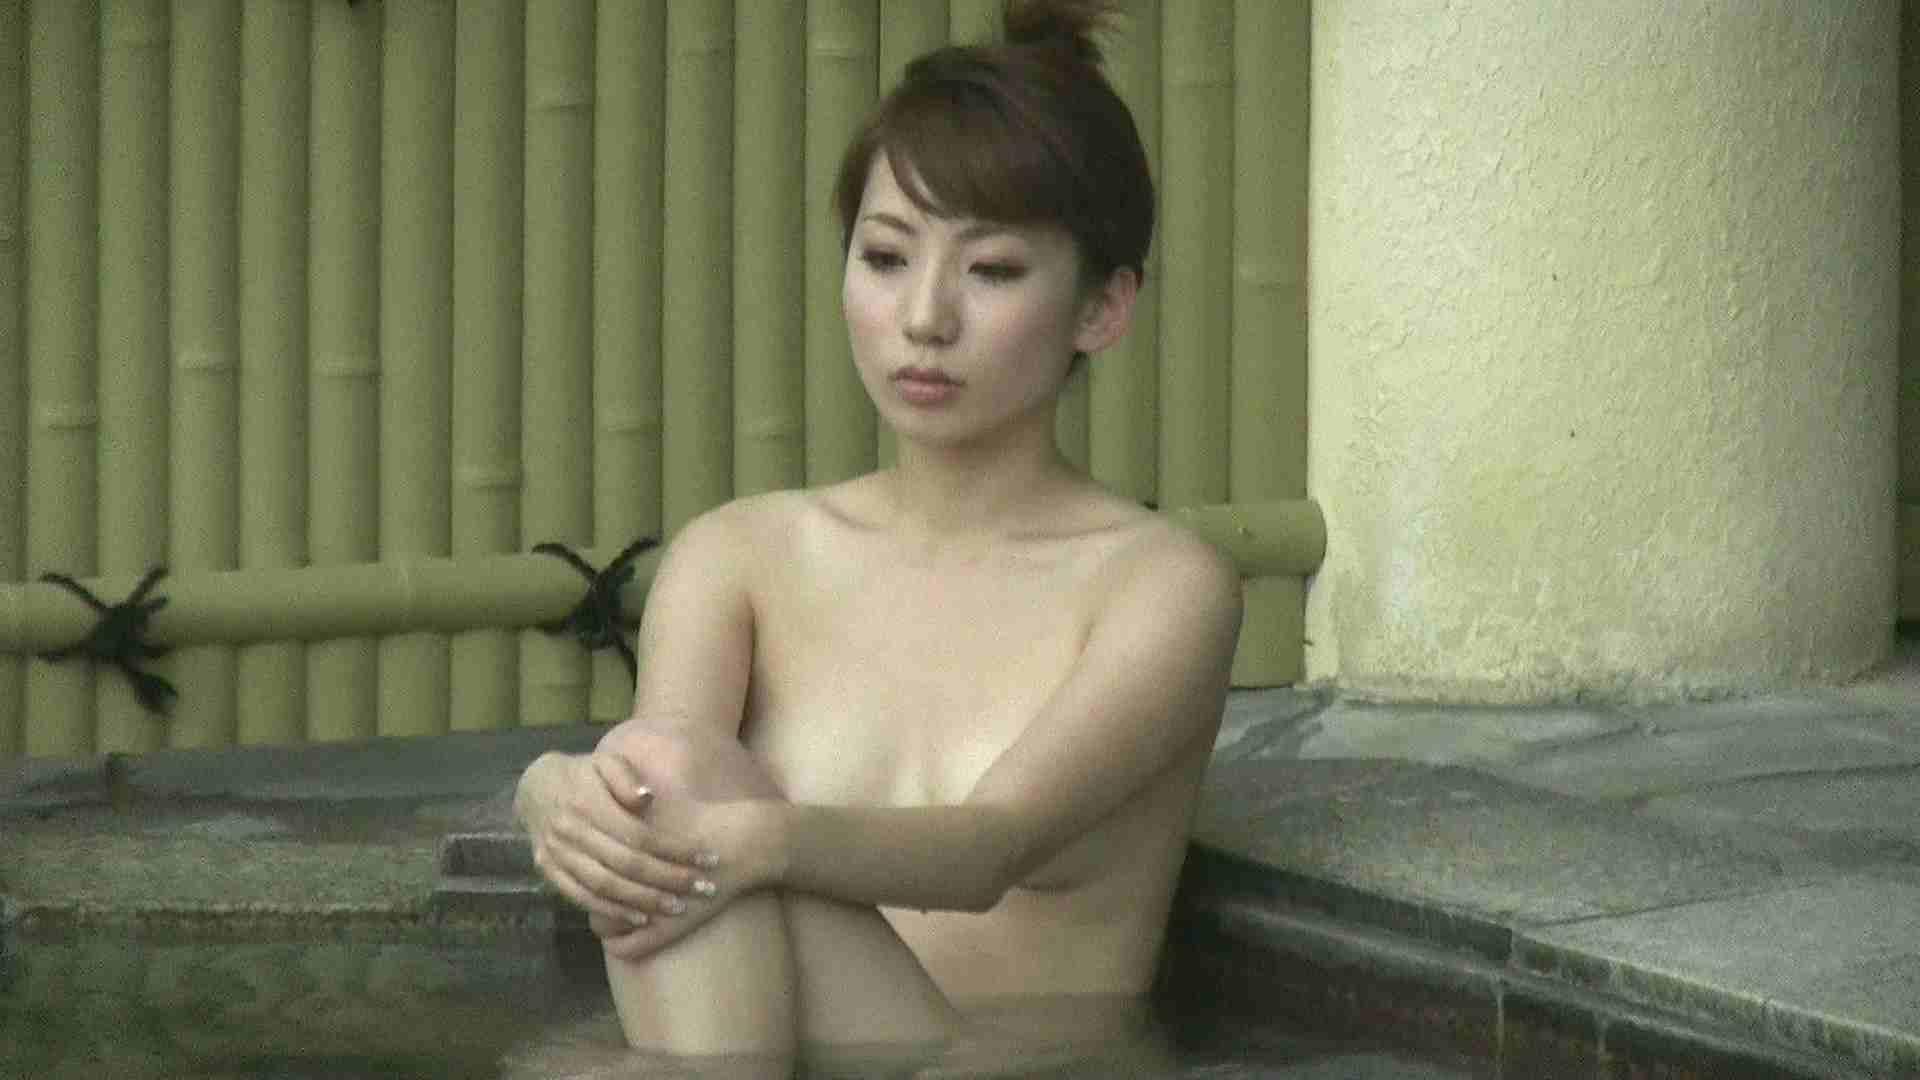 Aquaな露天風呂Vol.208 露天風呂編  103PIX 8